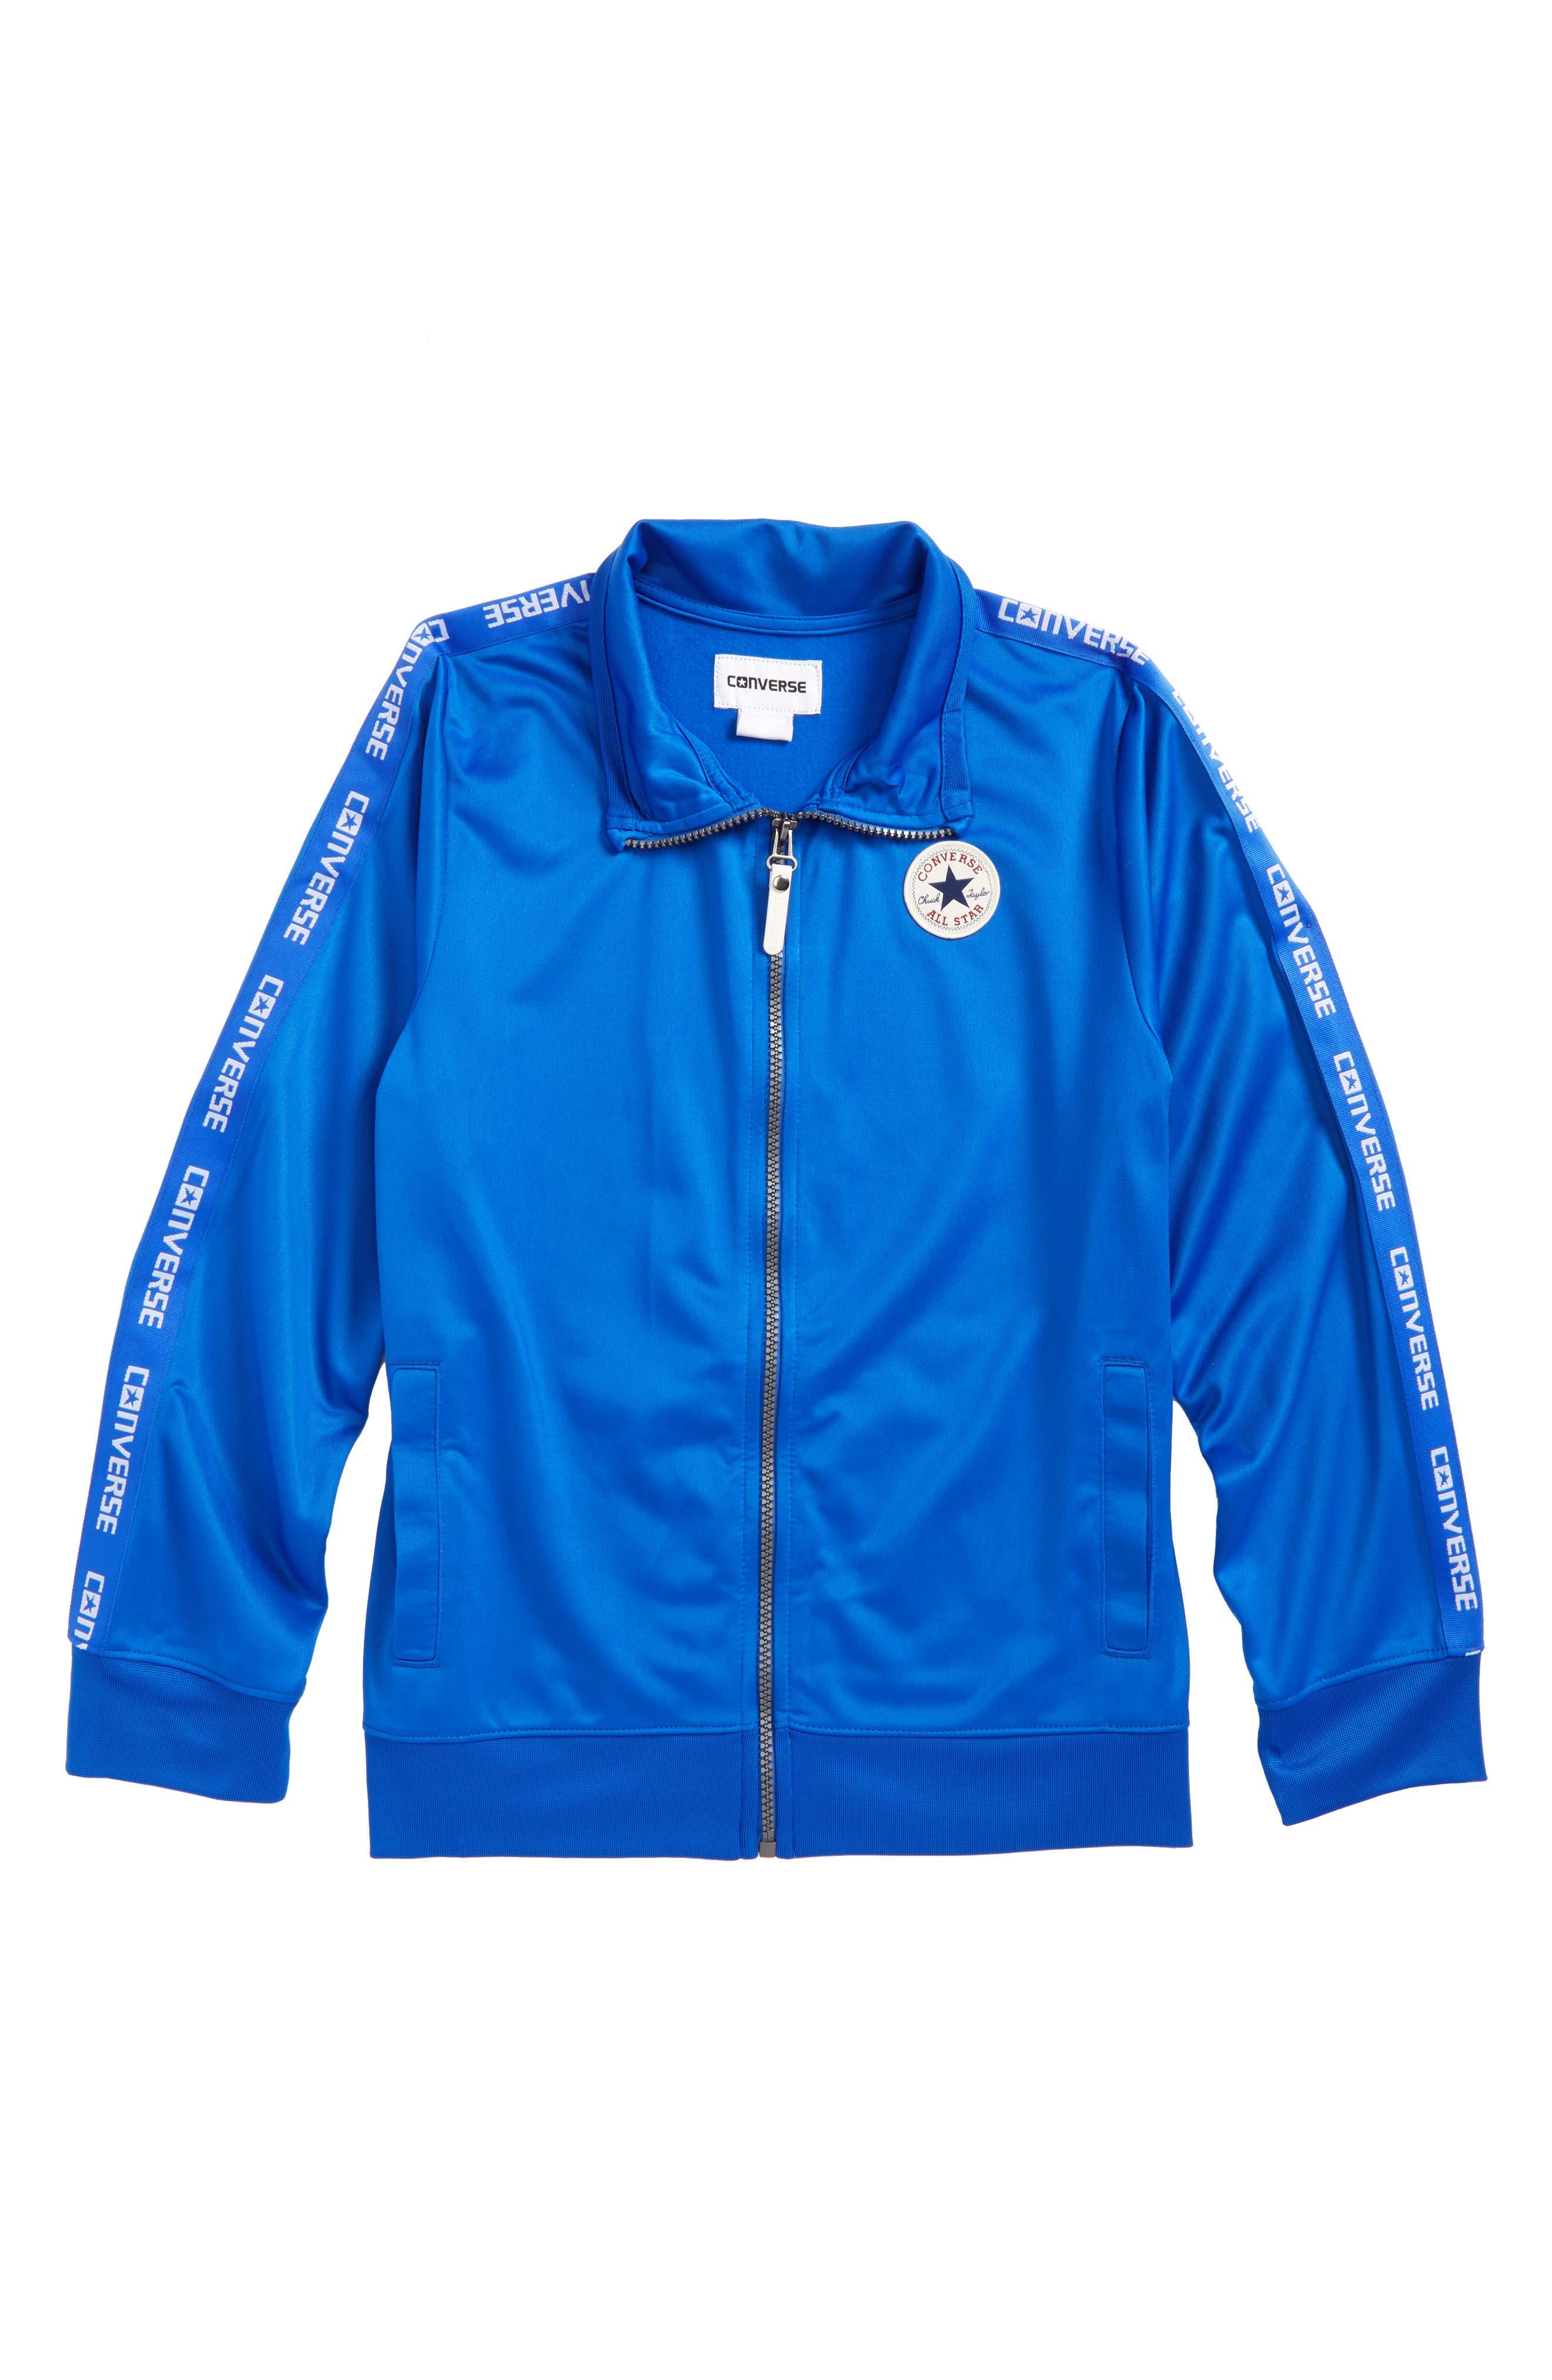 Main Image - Converse Logo Warm-Up Jacket (Big Boys)